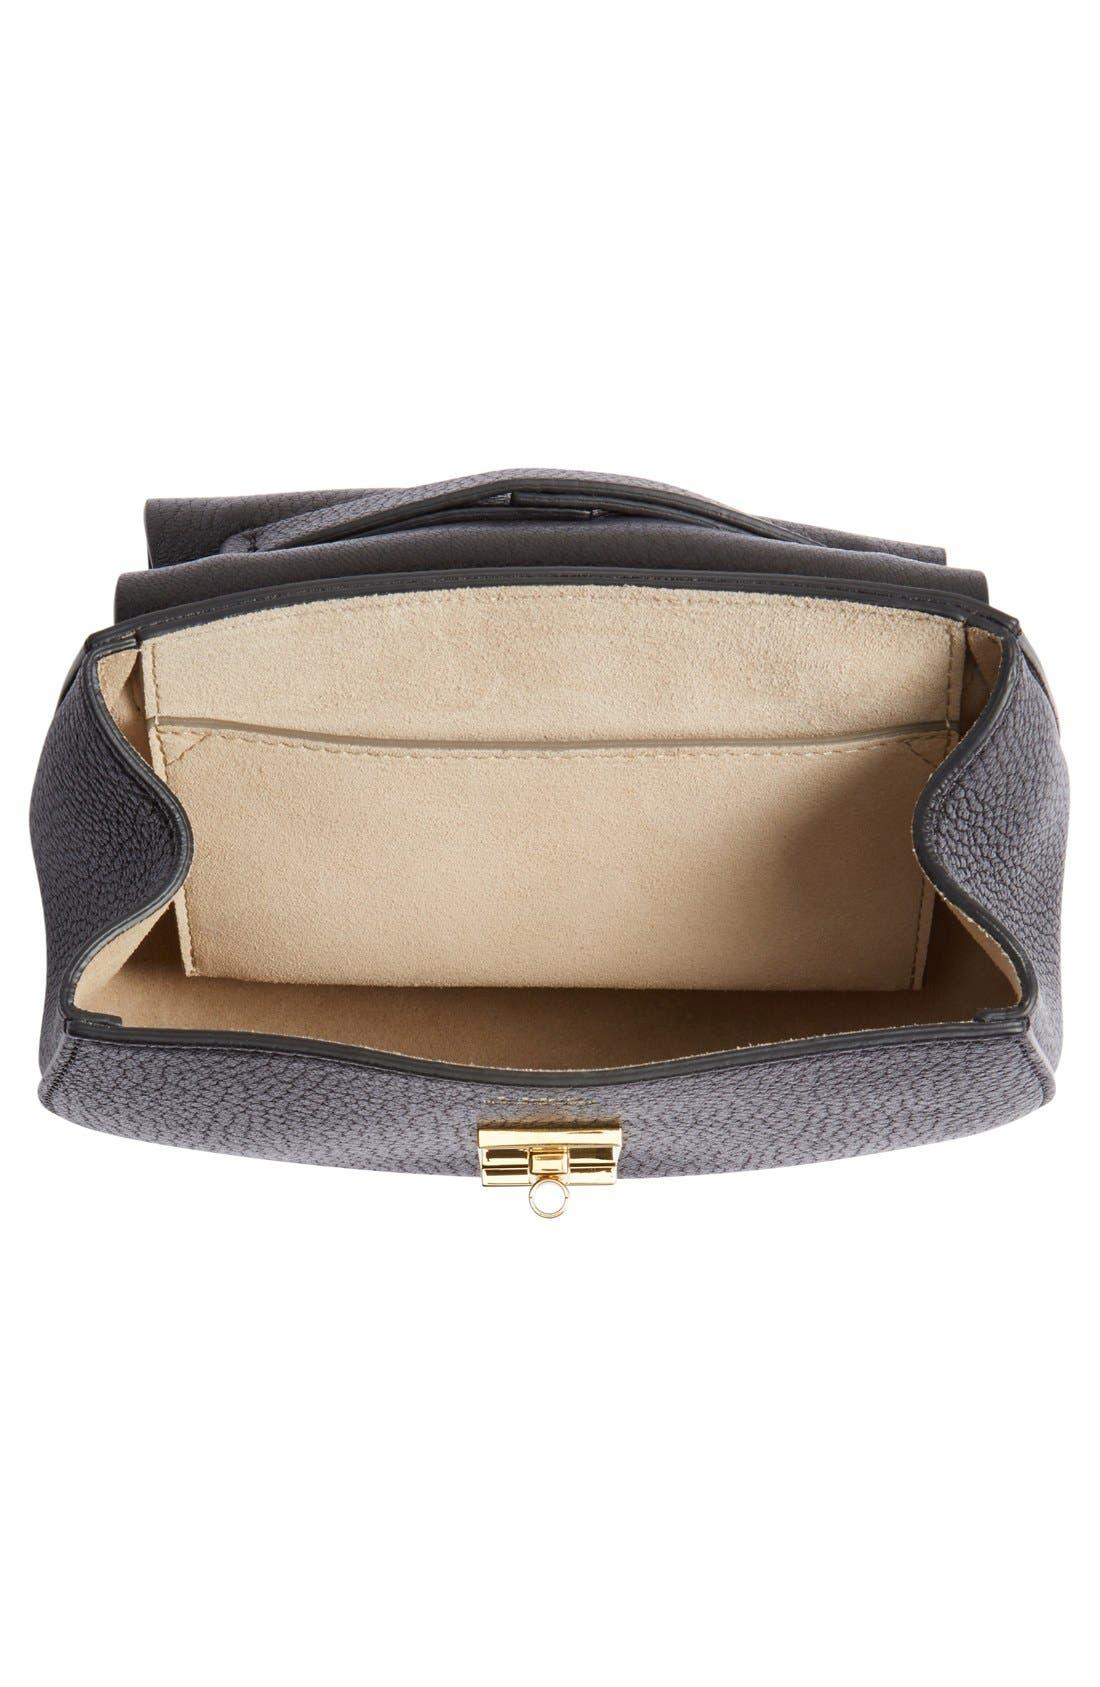 Alternate Image 4  - Chloé 'Mini Drew' Leather Shoulder Bag